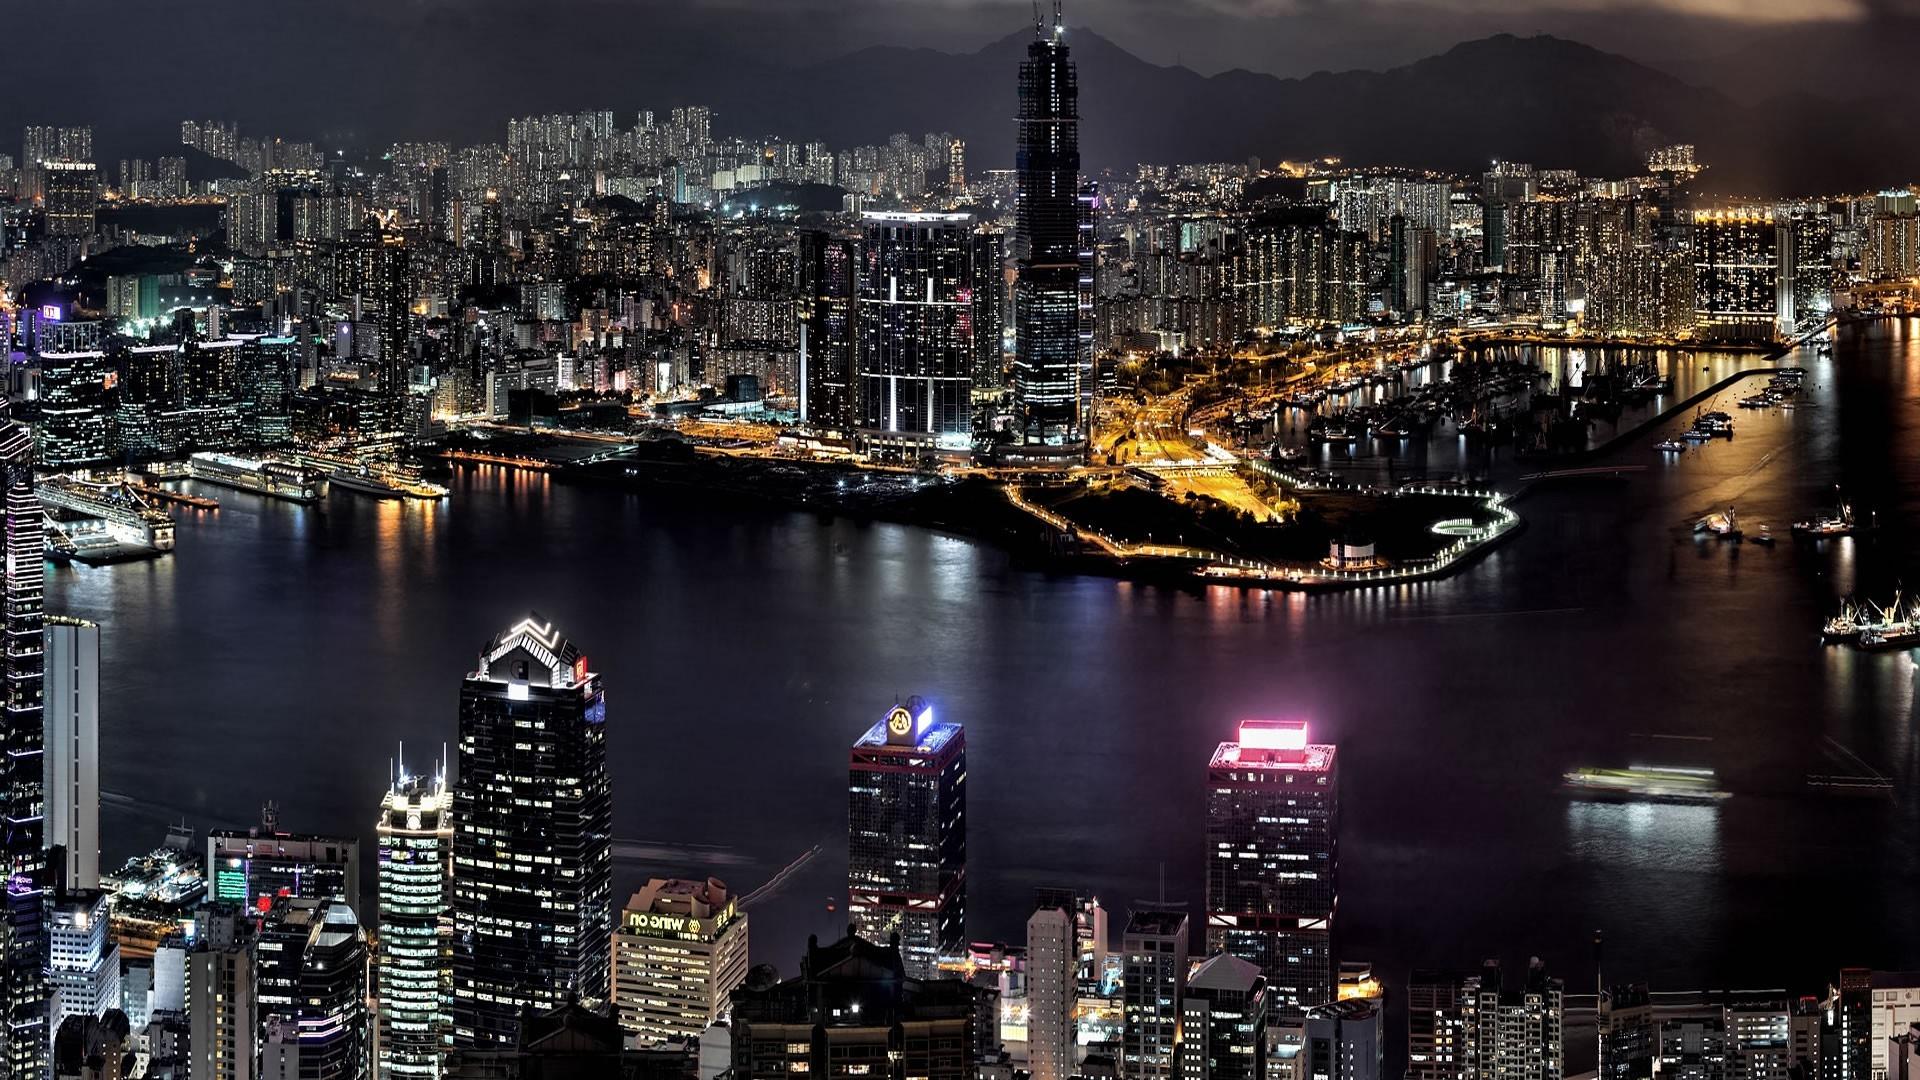 Wallpaper Hong Kong High Rise Buildings River Bank 1920x1080